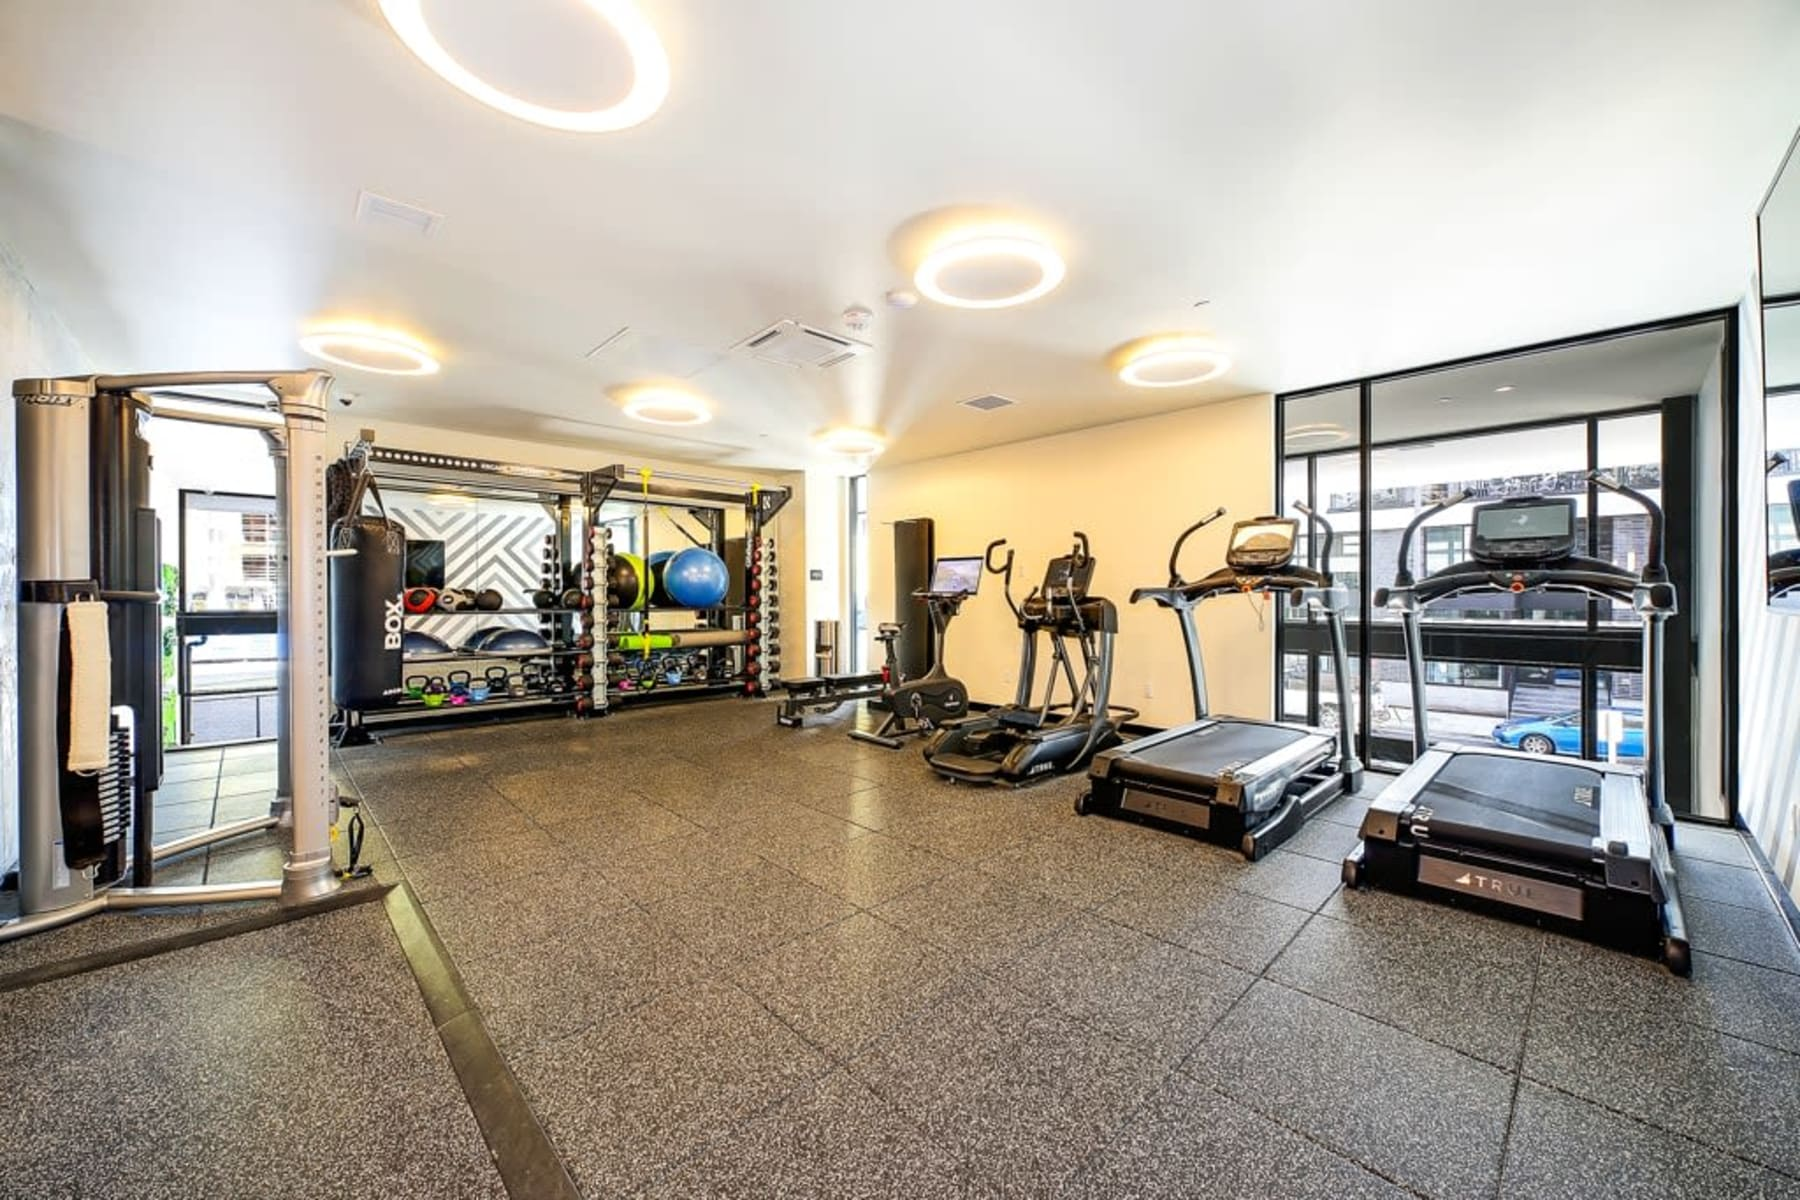 Fitness Center at Blackbird in Redmond, Washington